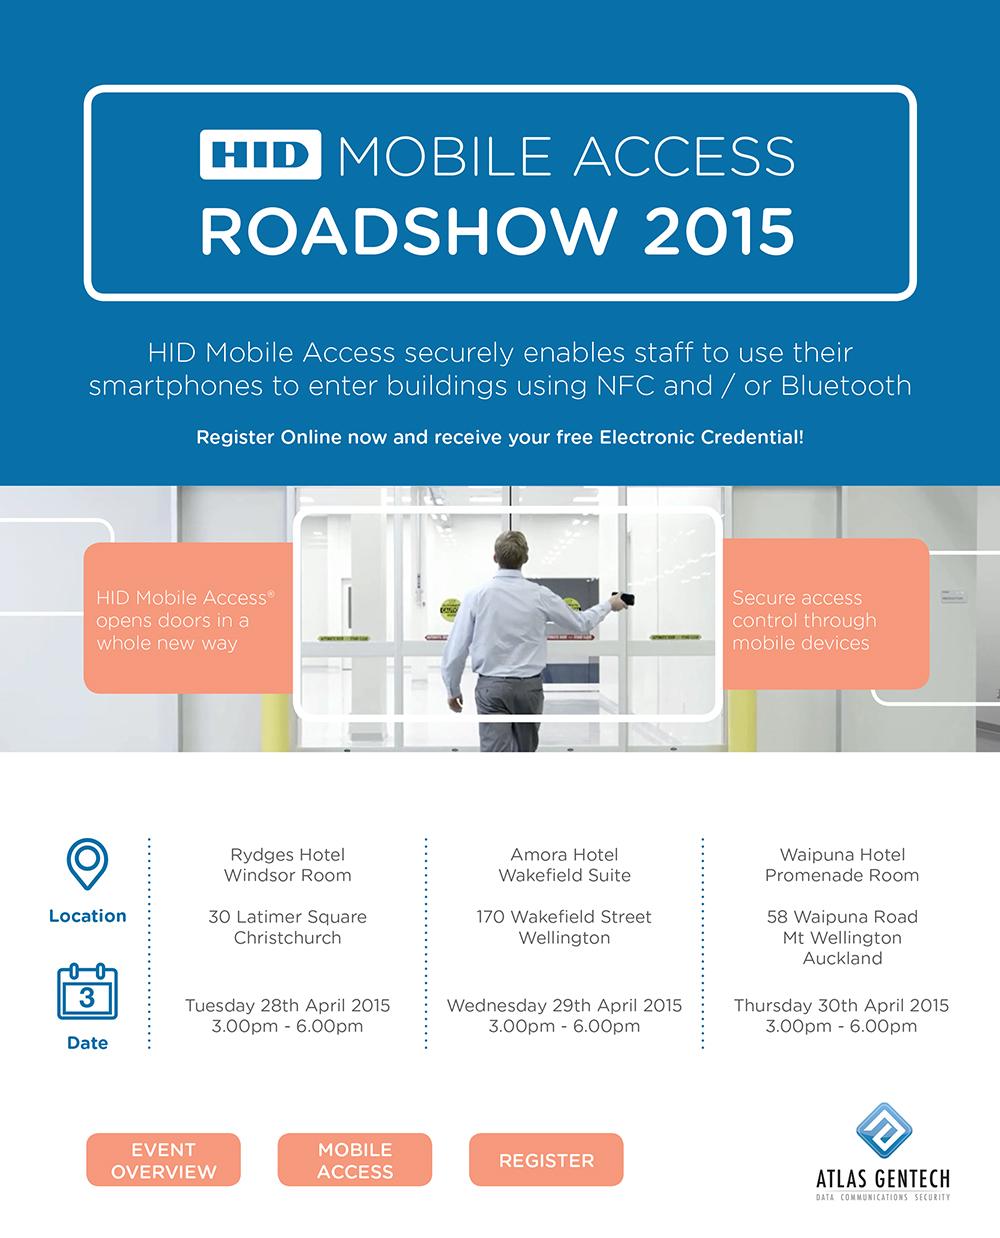 HID Mobile Access Roadshow